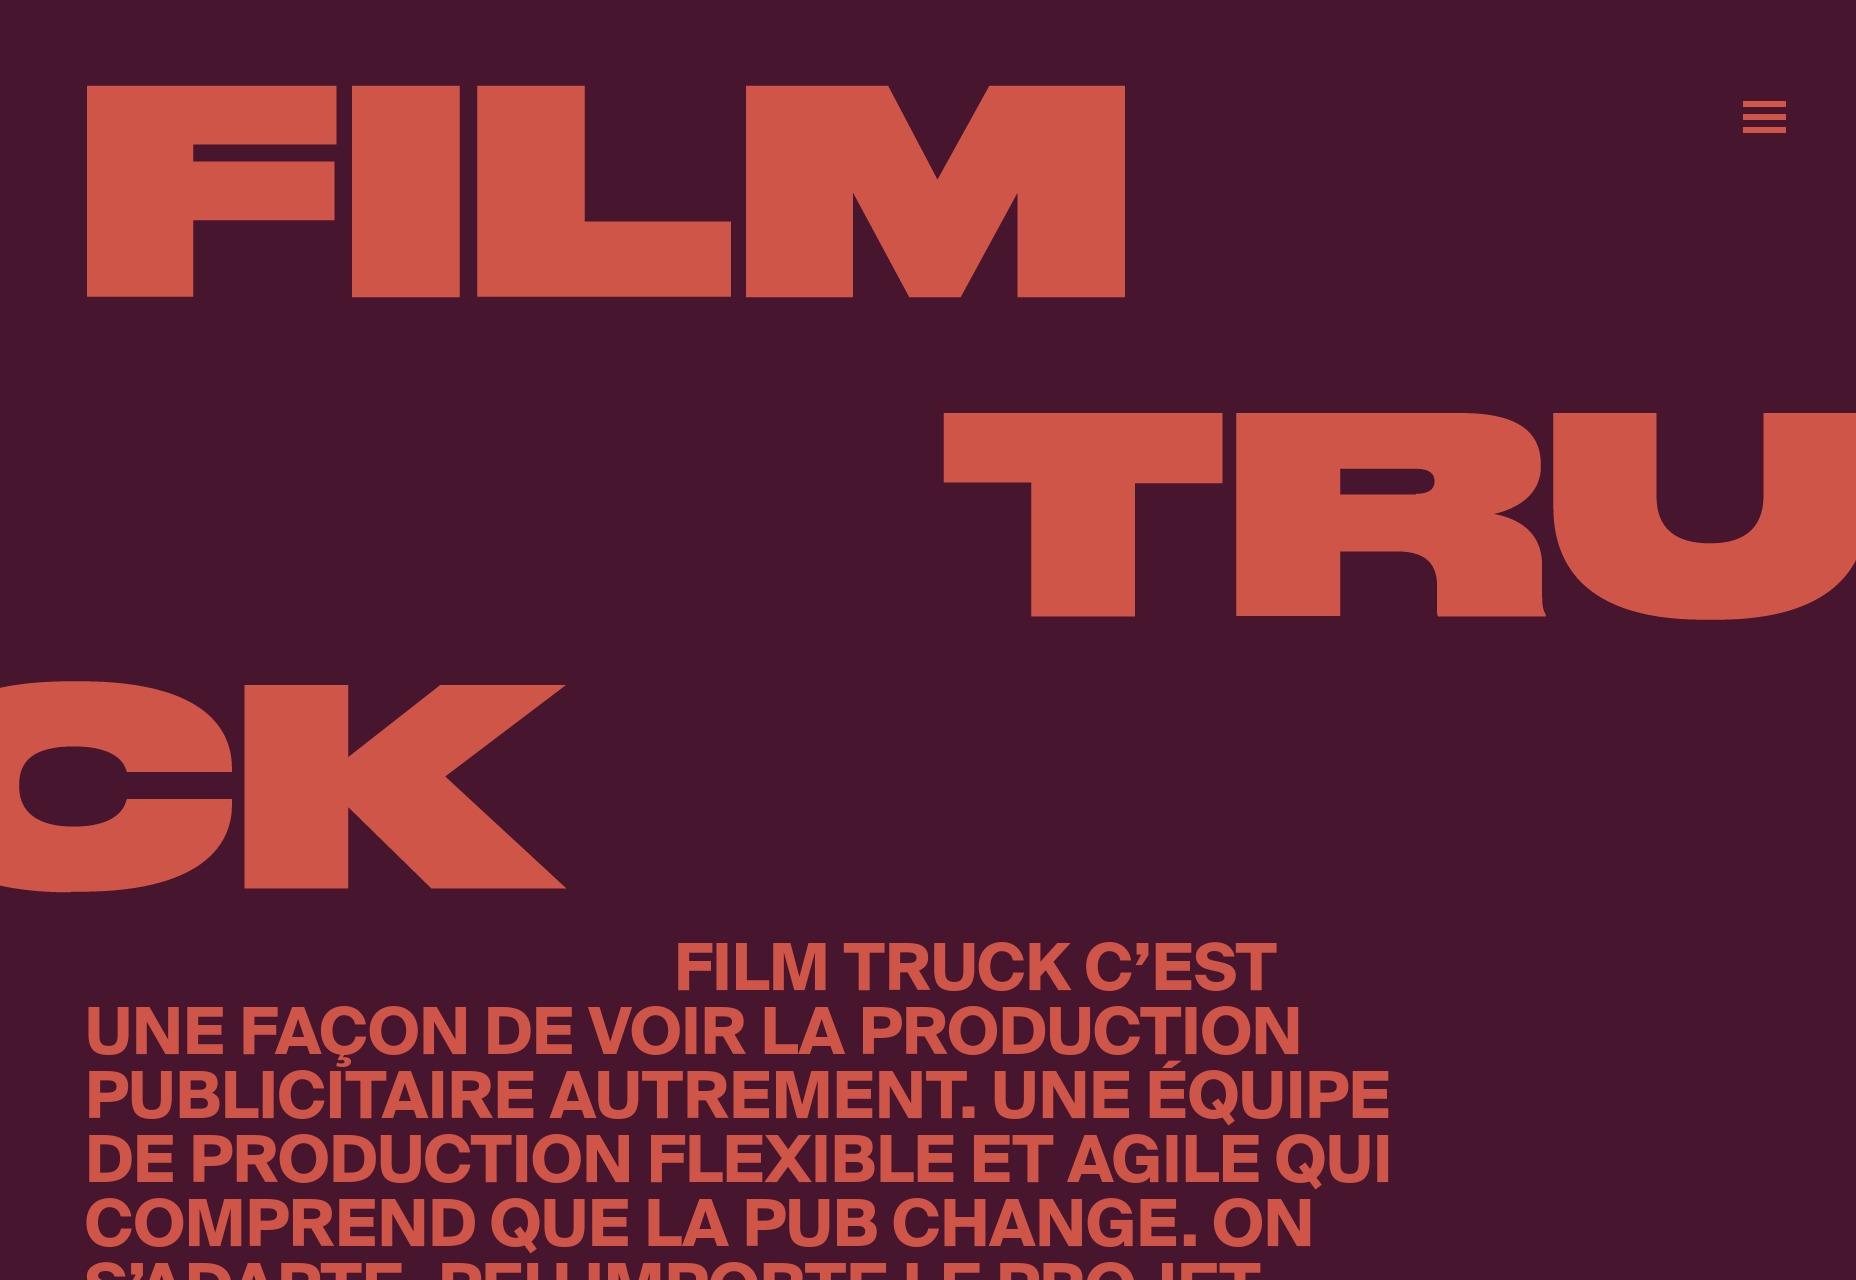 11.5 - Film Truck